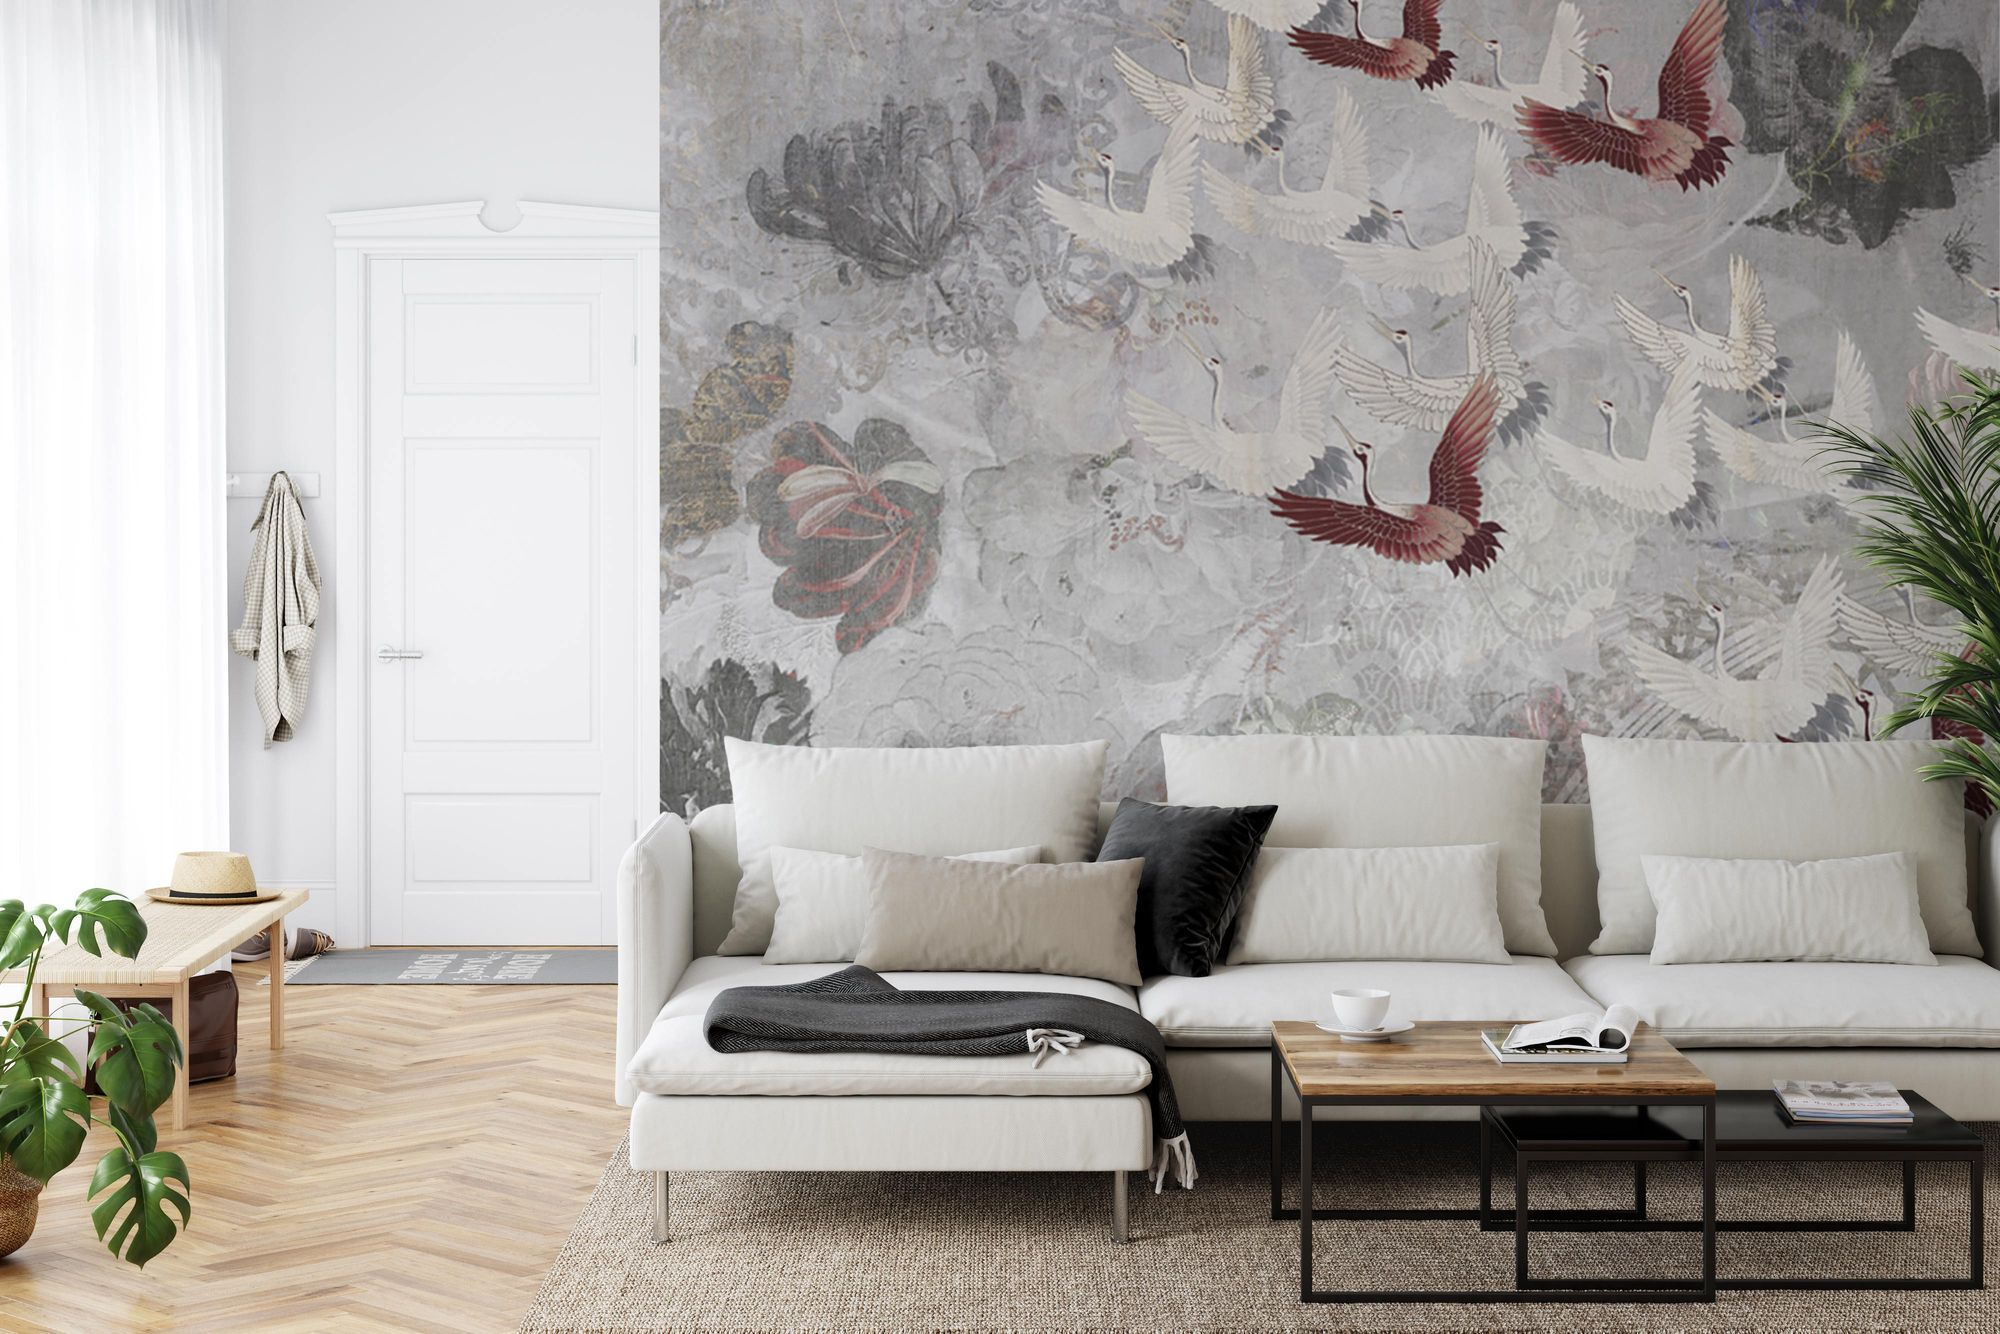 Muance 014373 Wci Wallpapers Pty Ltd Wallpaper South Africa Wallpaper Suppliers Home Decor Design